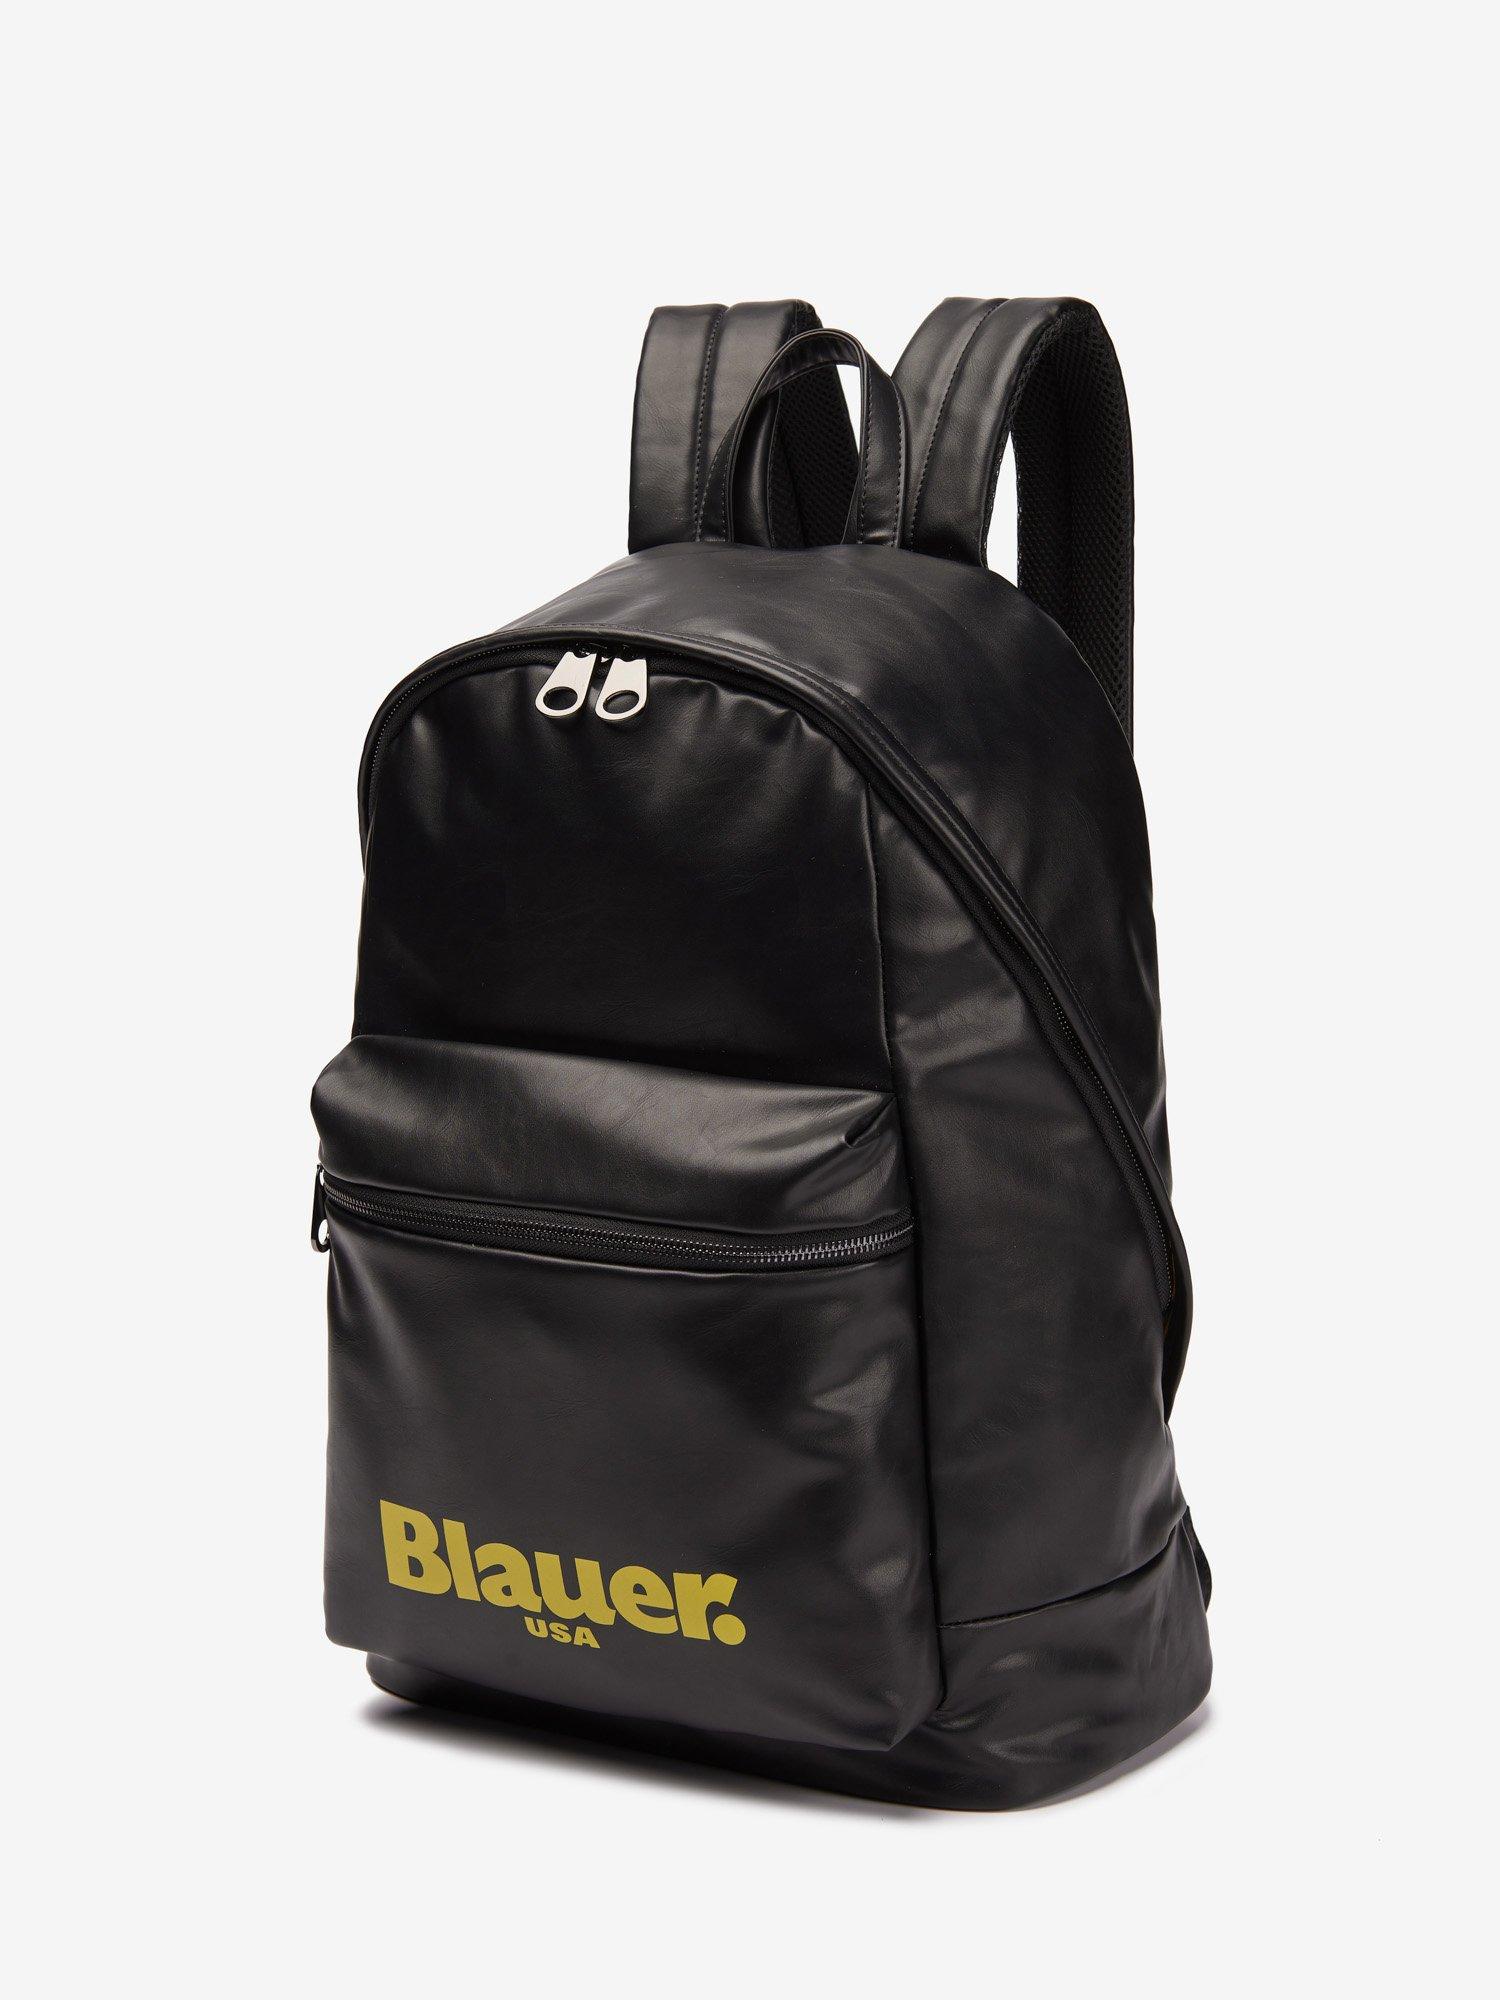 Blauer - AVALON BACKPACK - Negro - Blauer